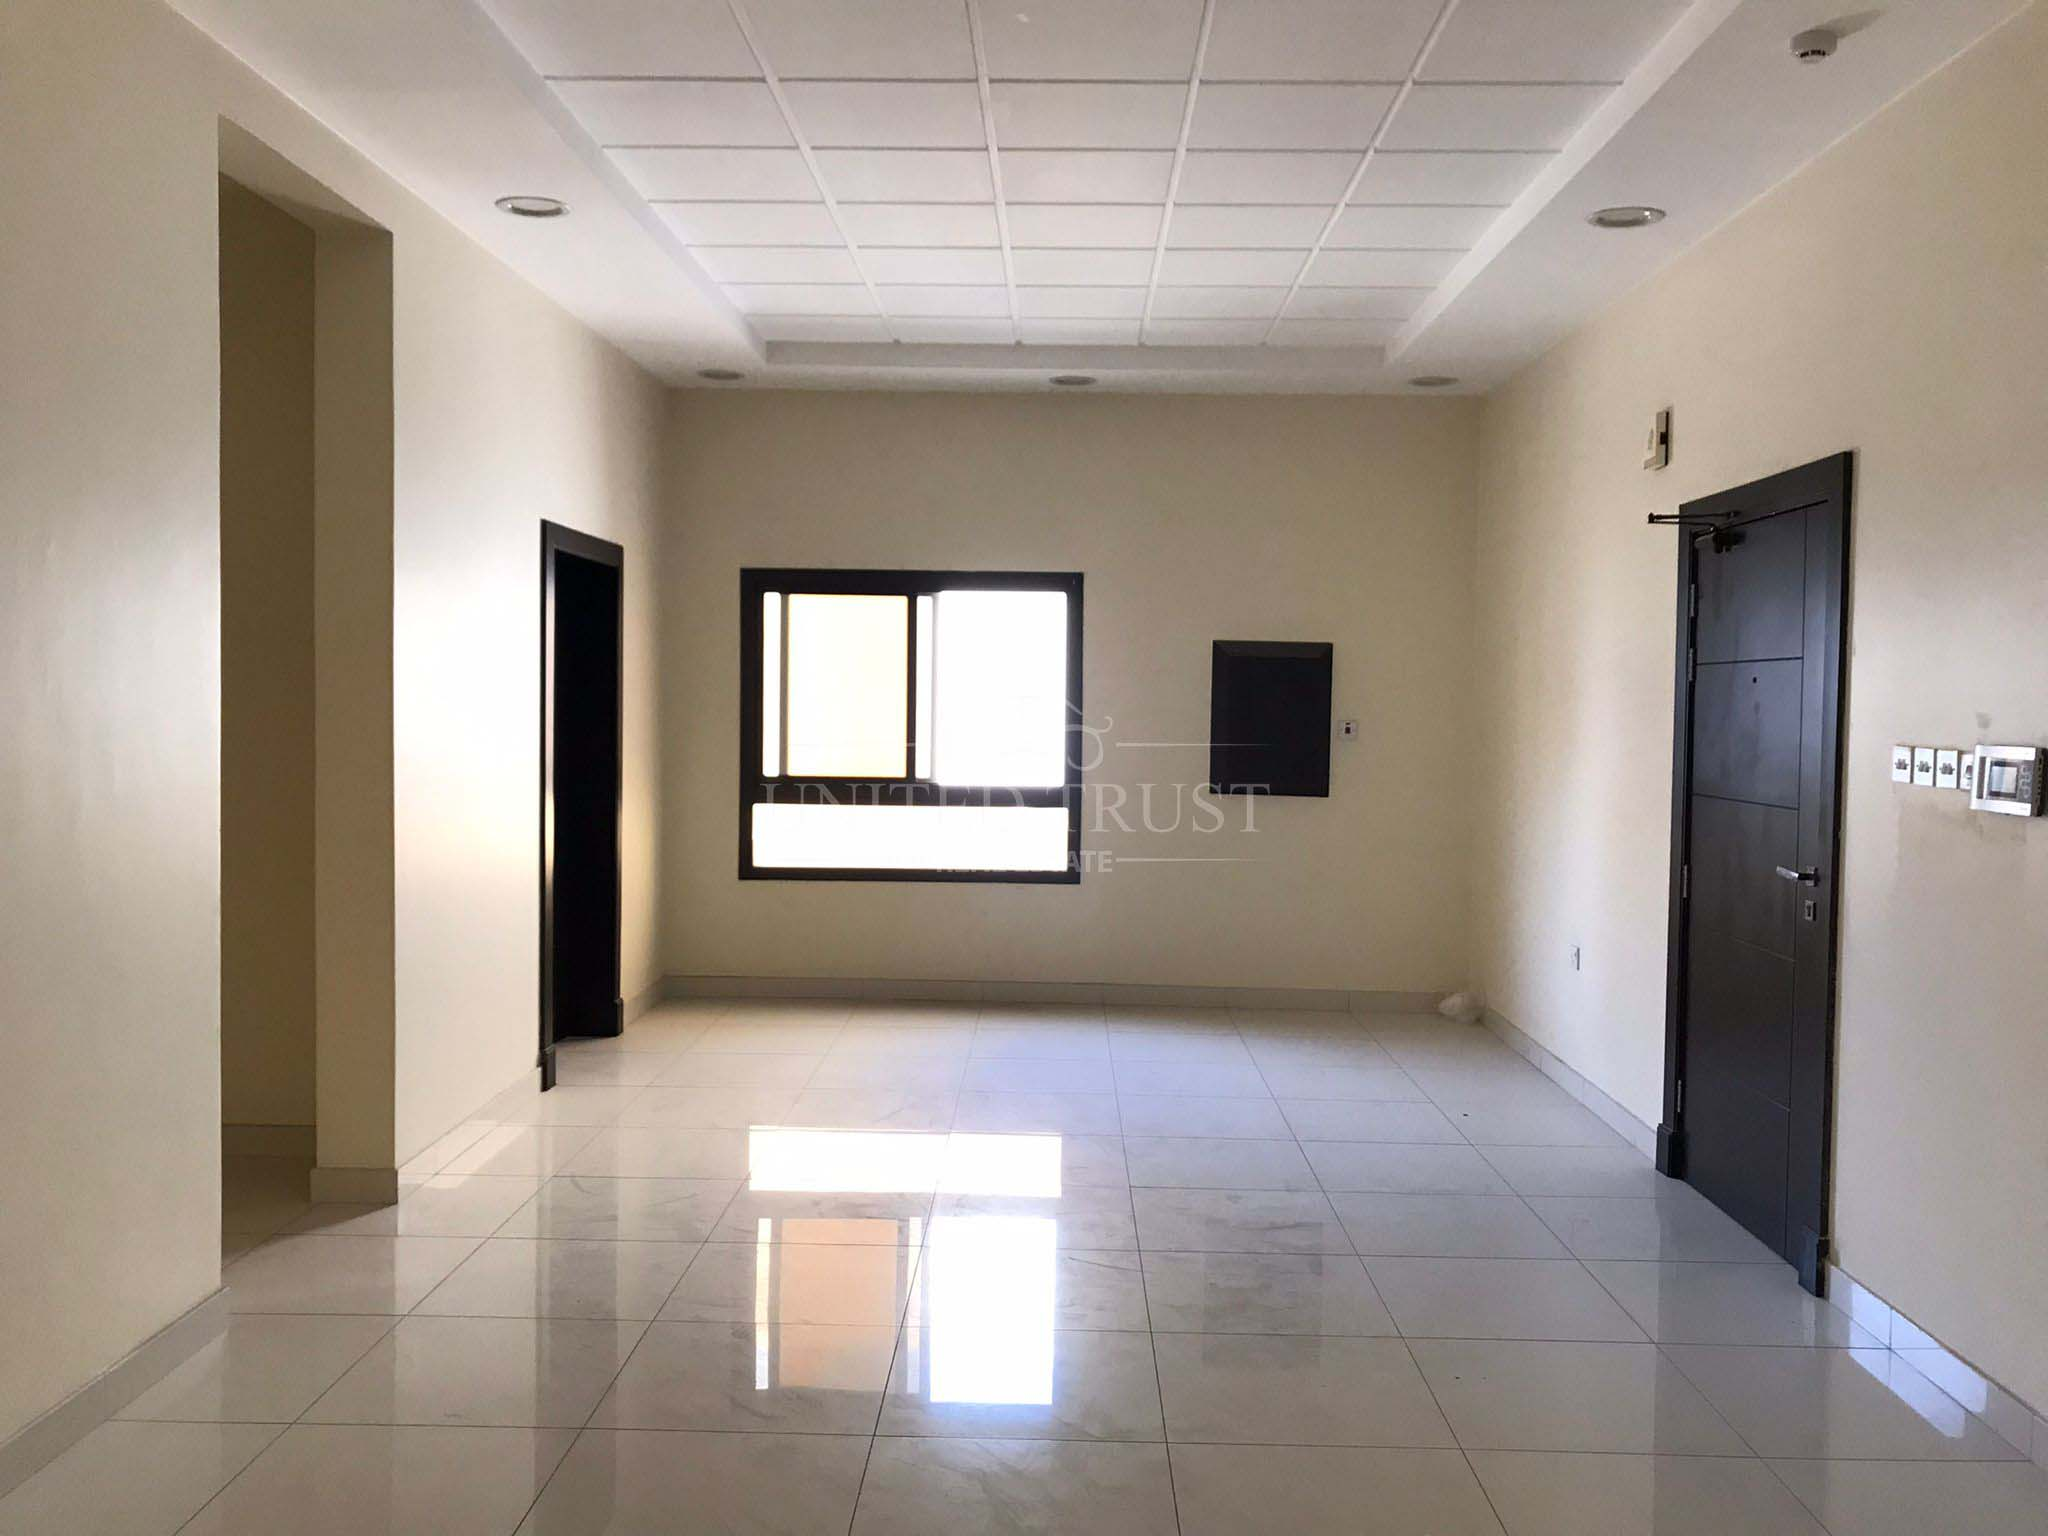 For rent a 2 bedrooms flat in Tubli Ref: TUB-AZ-030